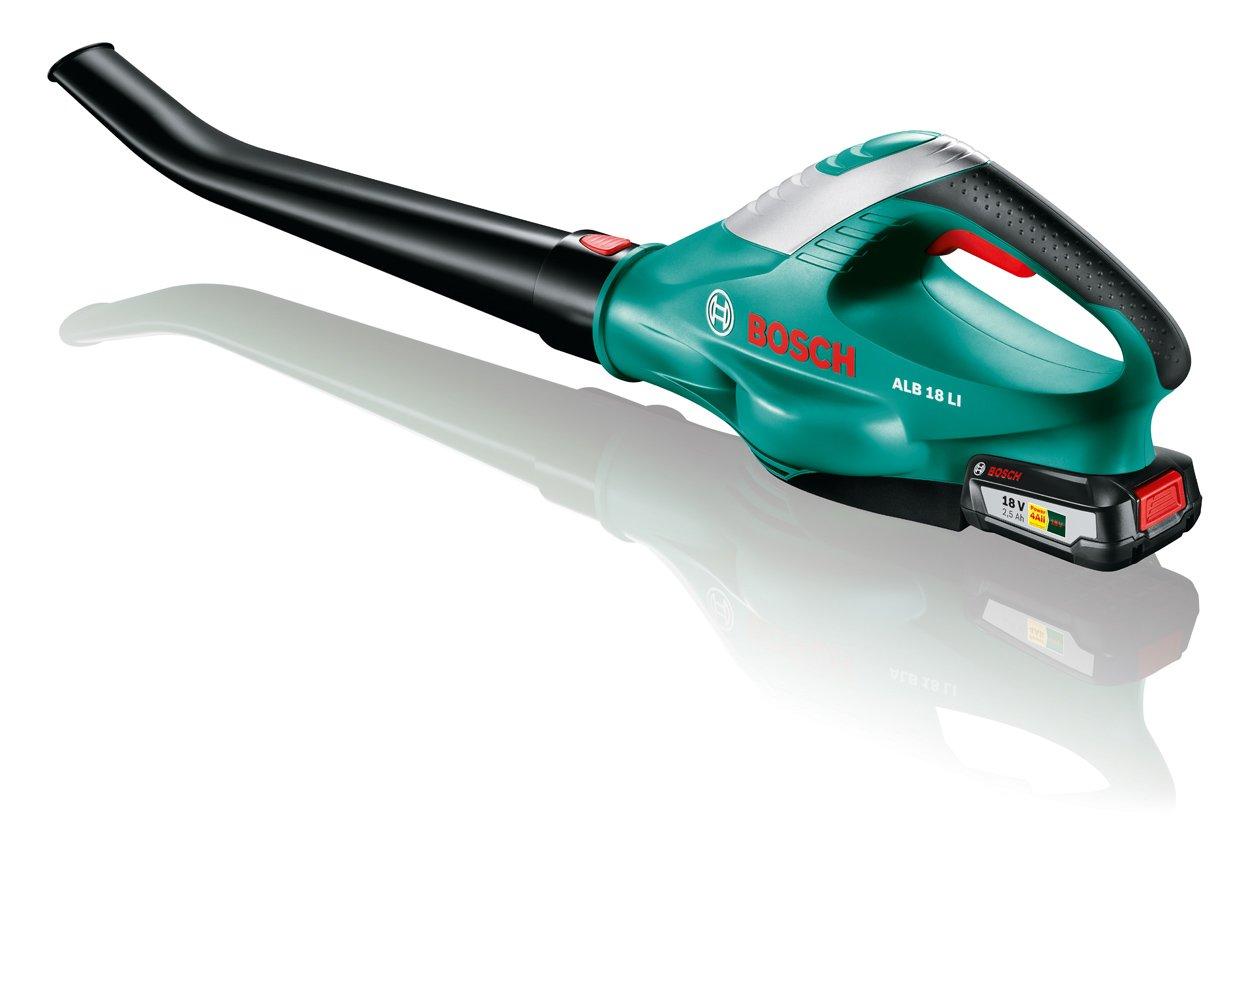 Bosch DIY Battery Leaf Blower Alb 18Li, Battery, Charger, 06008A0501